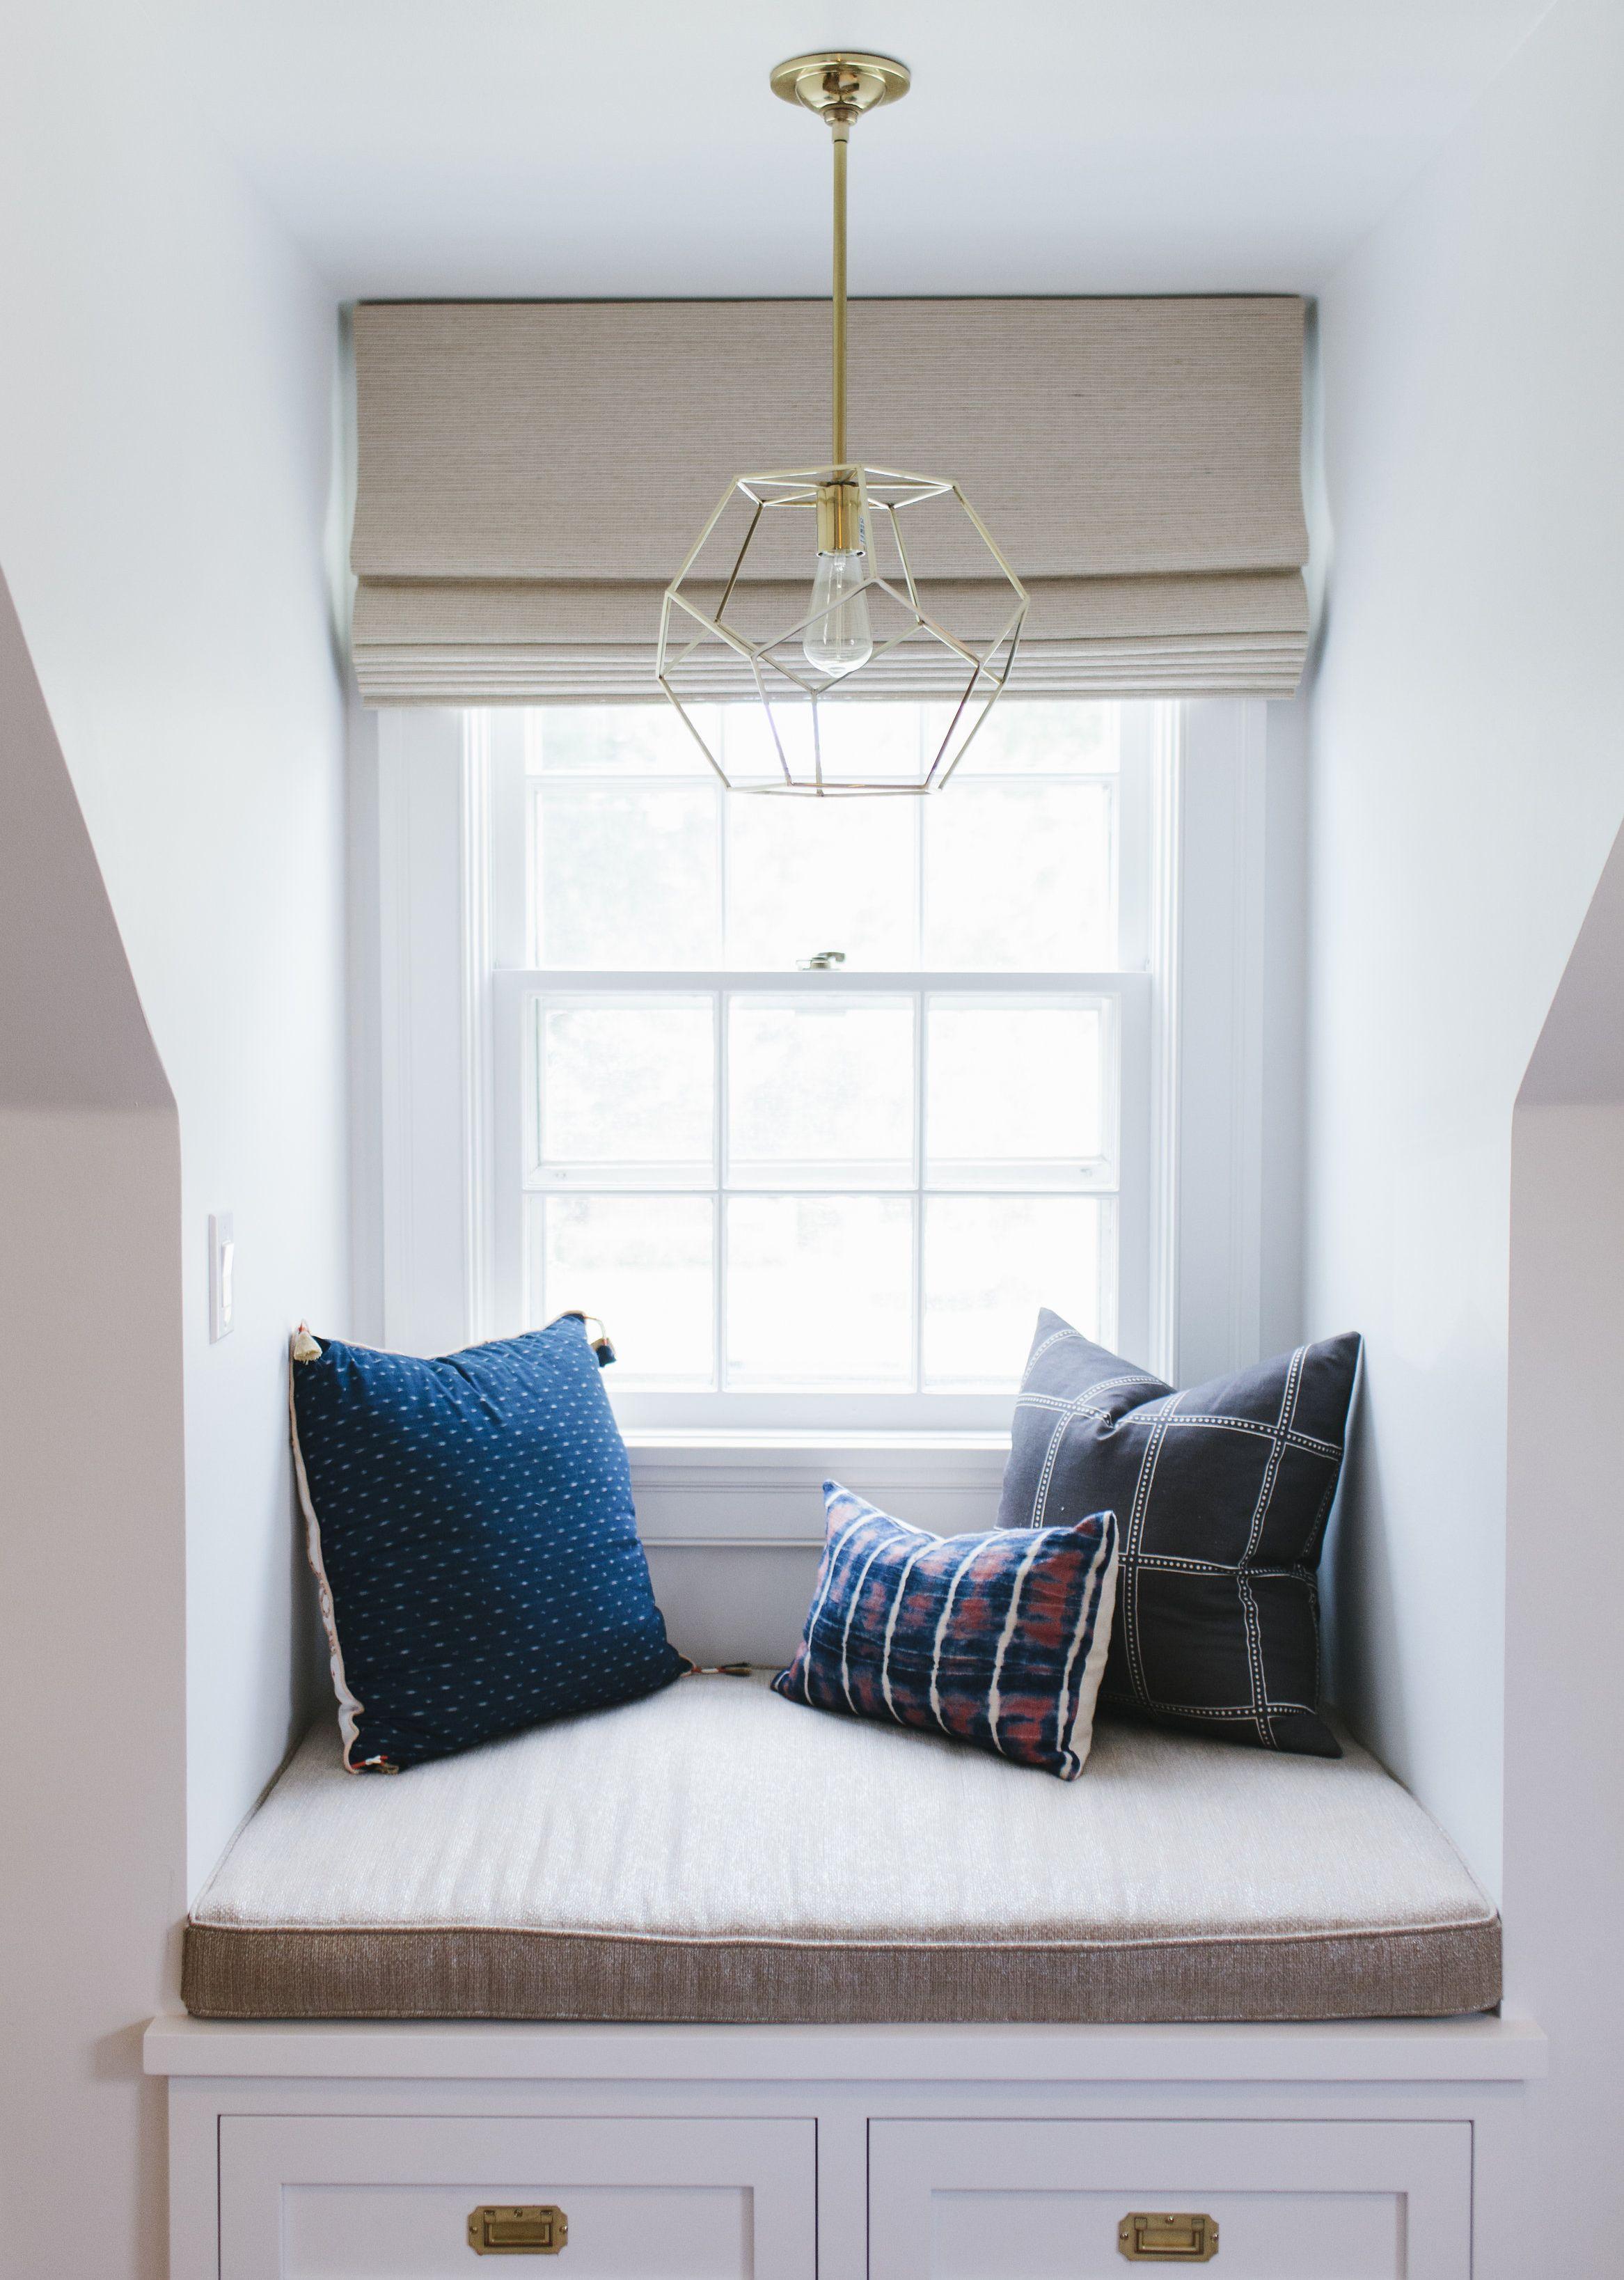 Lynwood Remodel Master Bedroom And Bath Remodel Bedroom Bedroom Window Seat Home Decor Bedroom